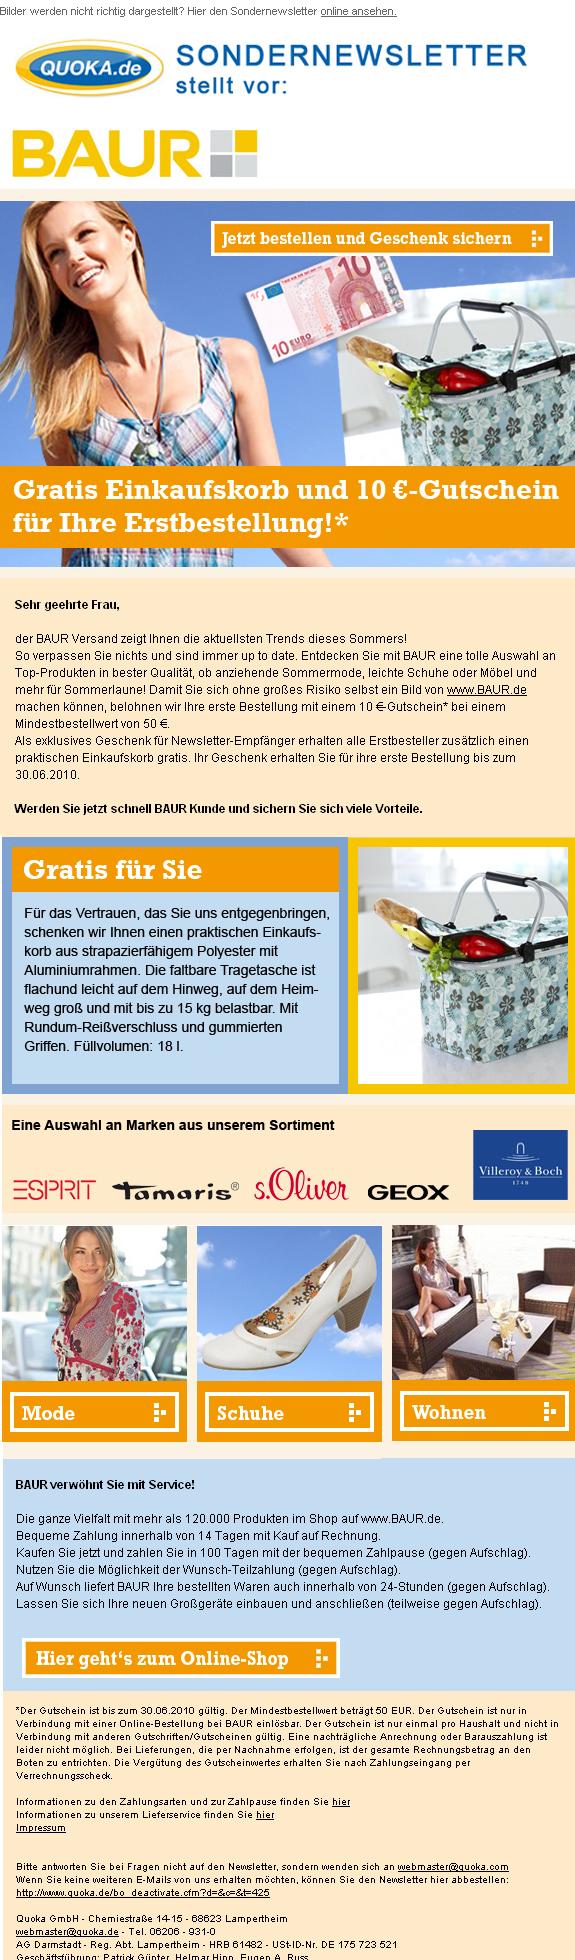 postina.net - Newsletter und E-Mail-Marketing: quoka.de flexibles ...